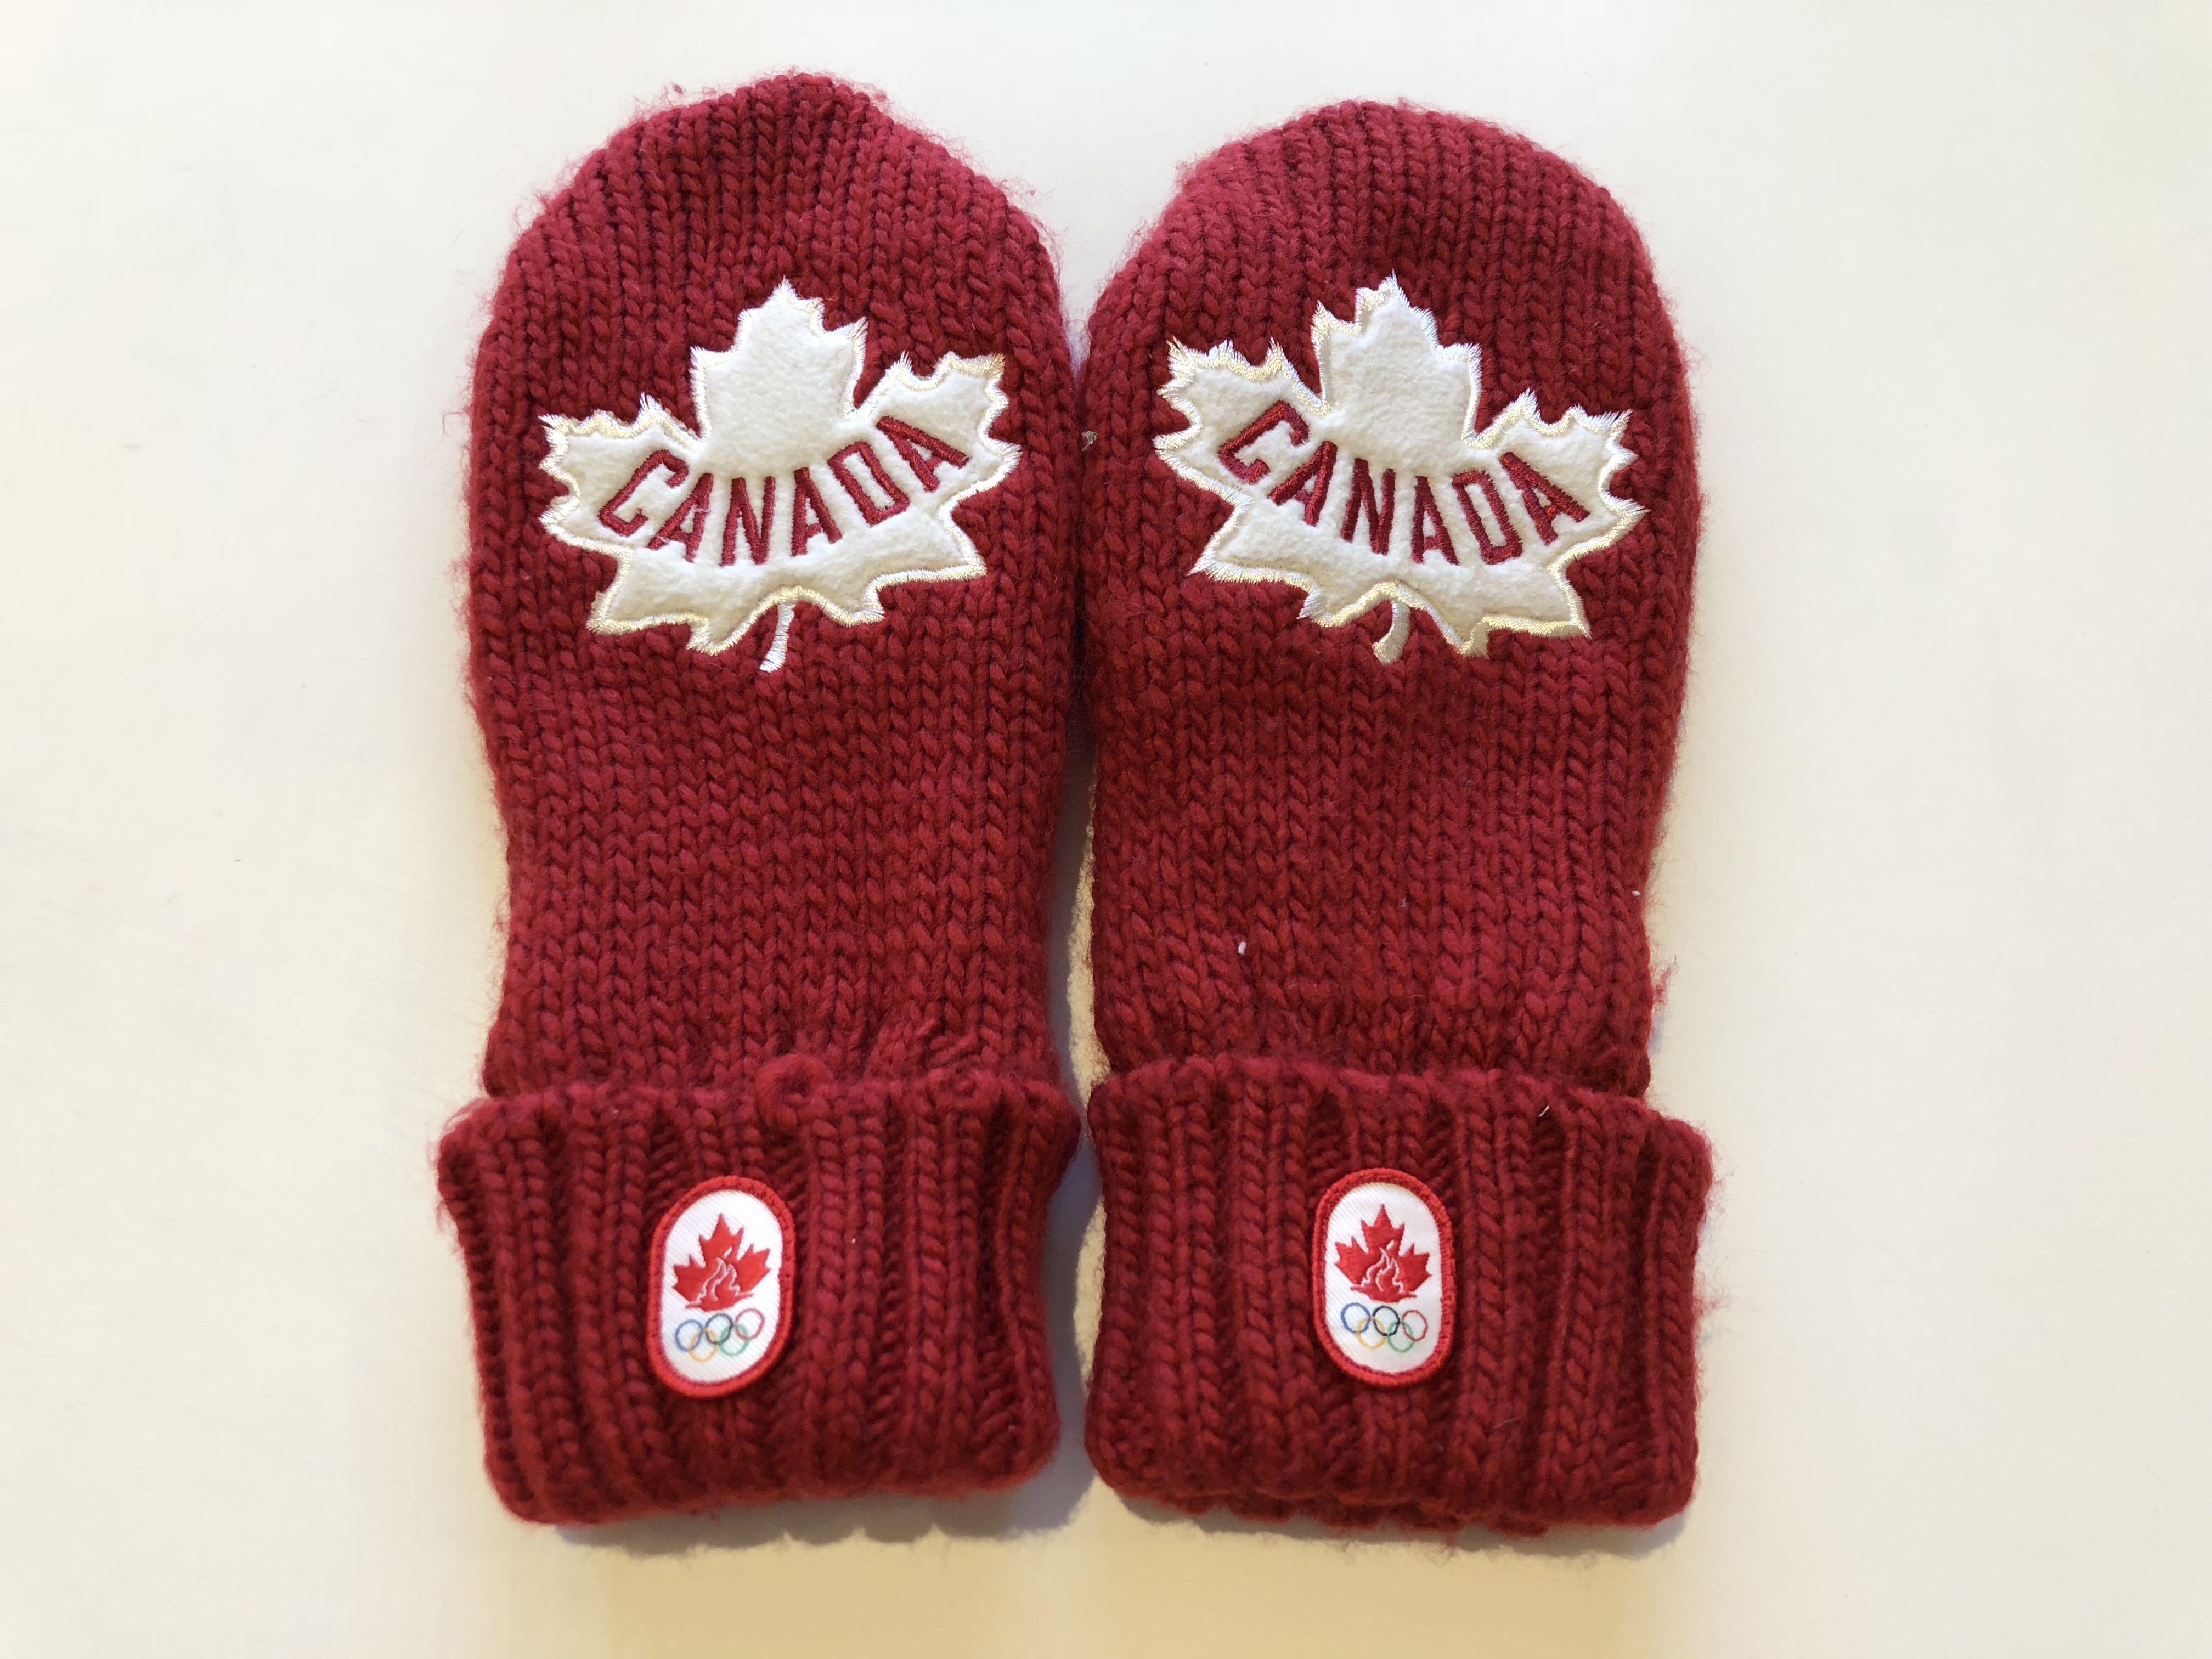 Canada 2012 winter olympics mittens